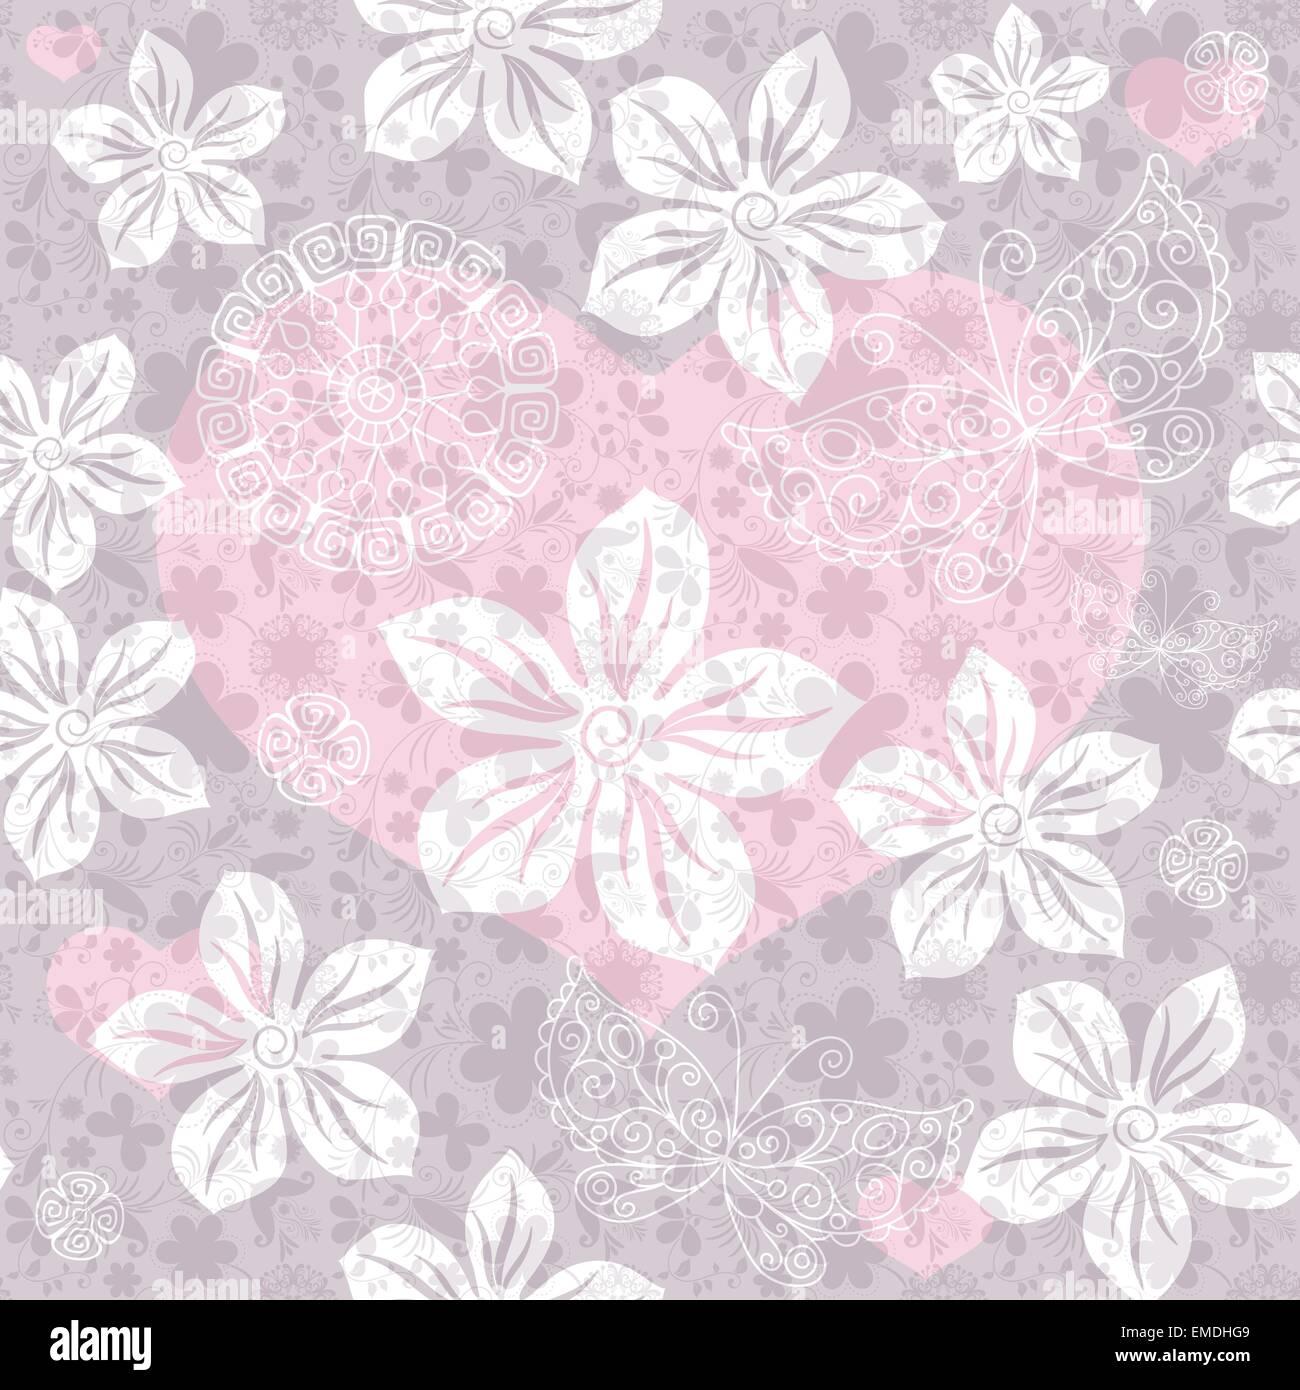 Seamless gentle valentine pattern - Stock Image